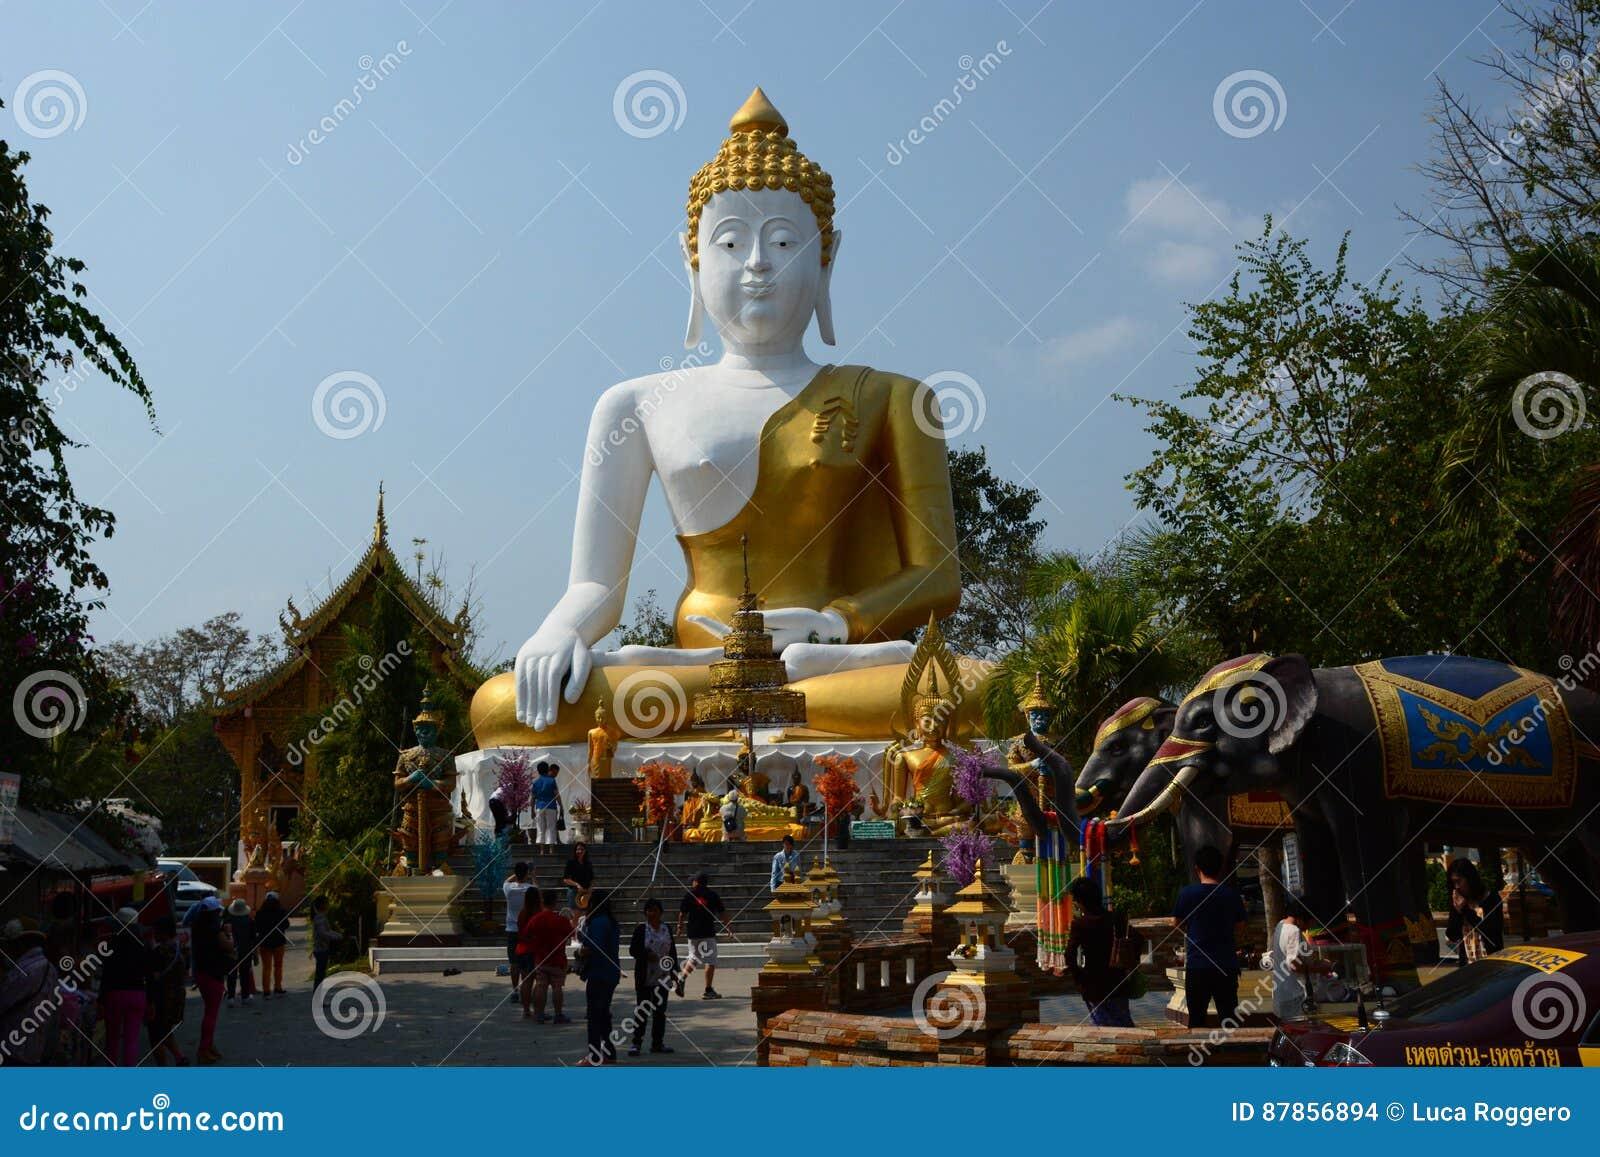 Marble Temple Home Decoration Sitting Buddha Statue Wat Phra That Doi Kham Temple